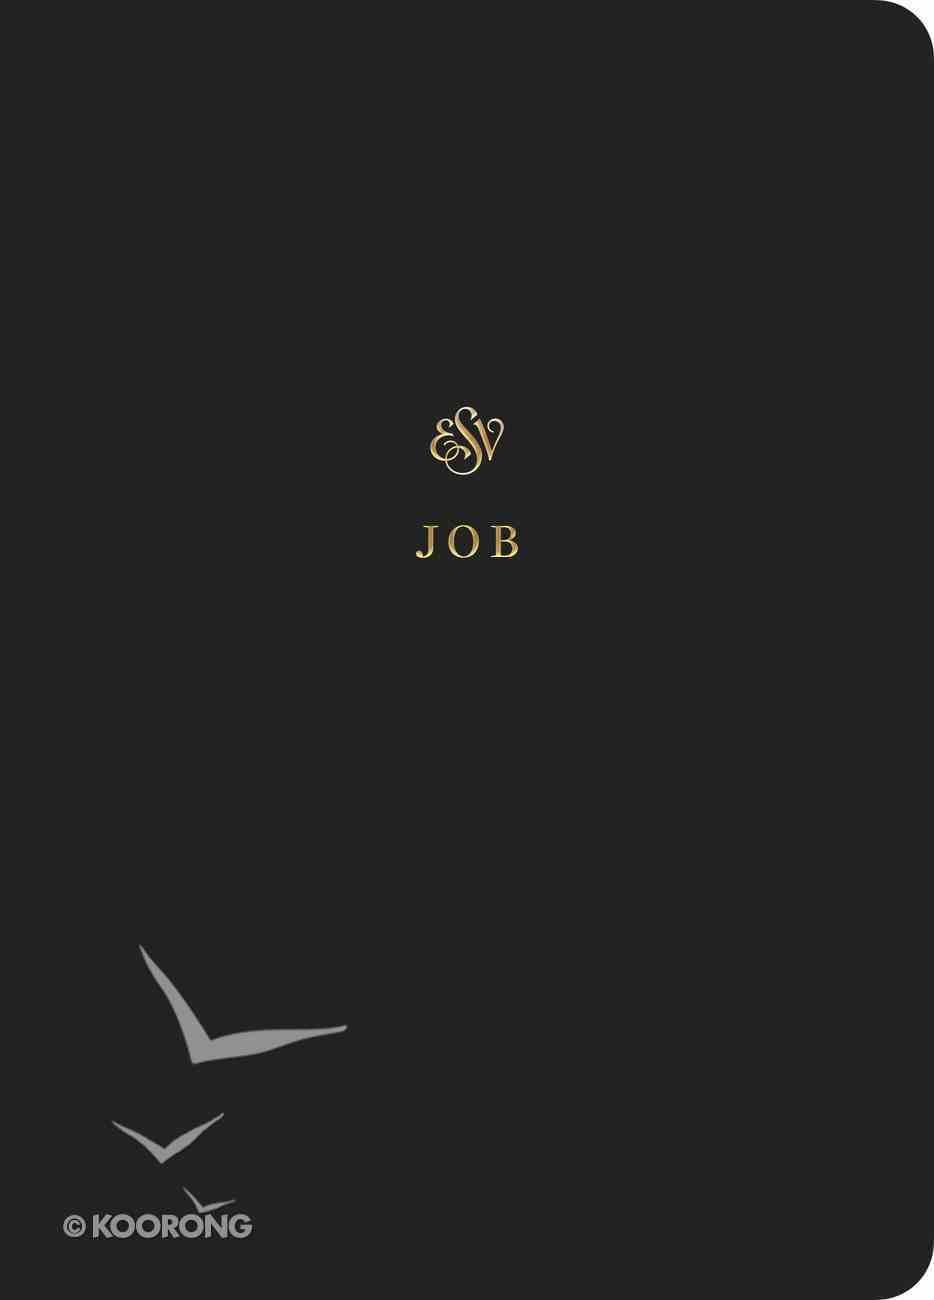 ESV Scripture Journal Job Paperback